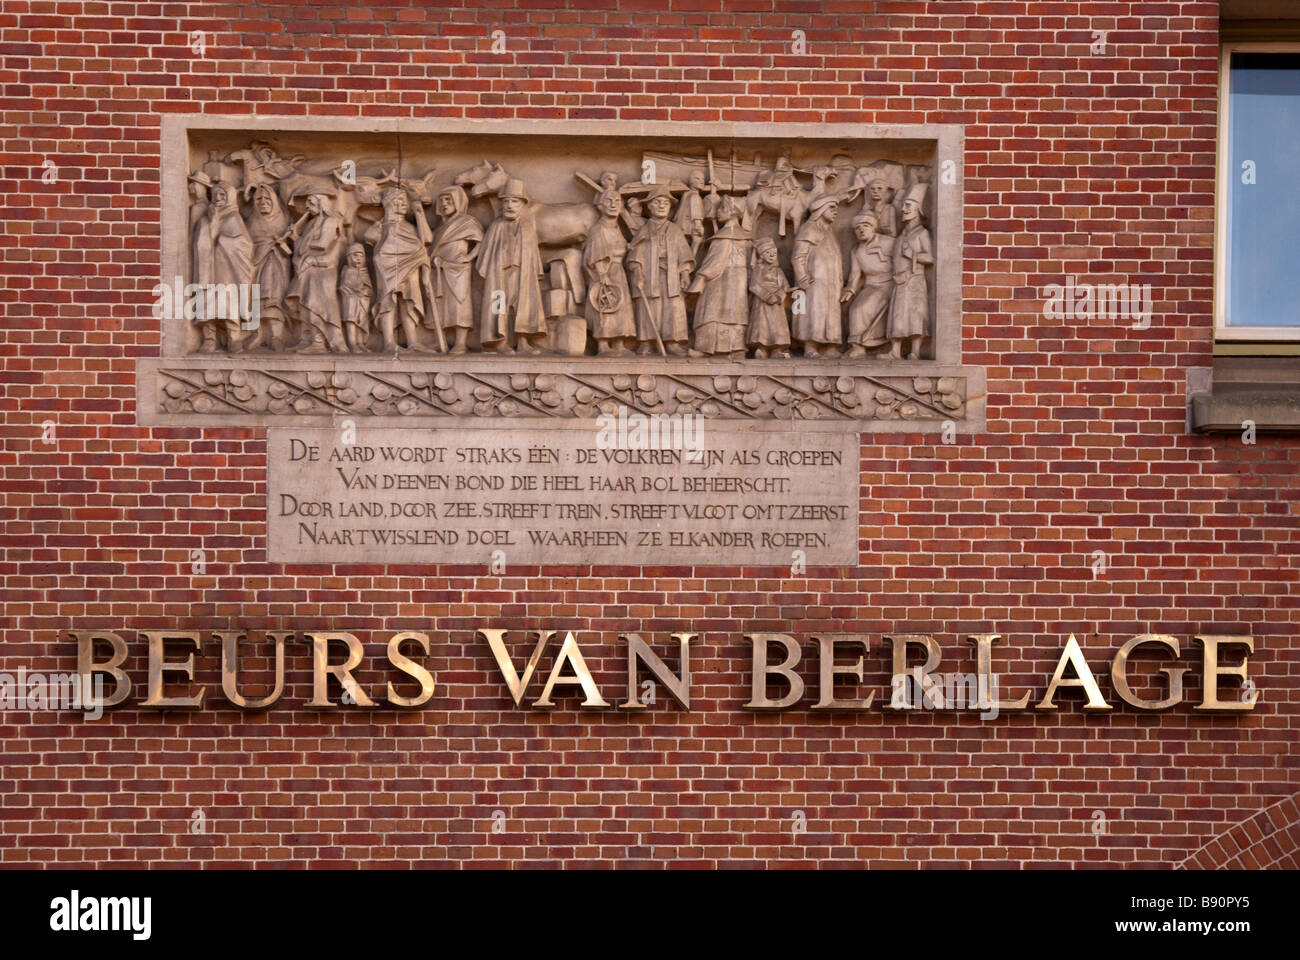 Beurs berlage building amsterdam stock photos